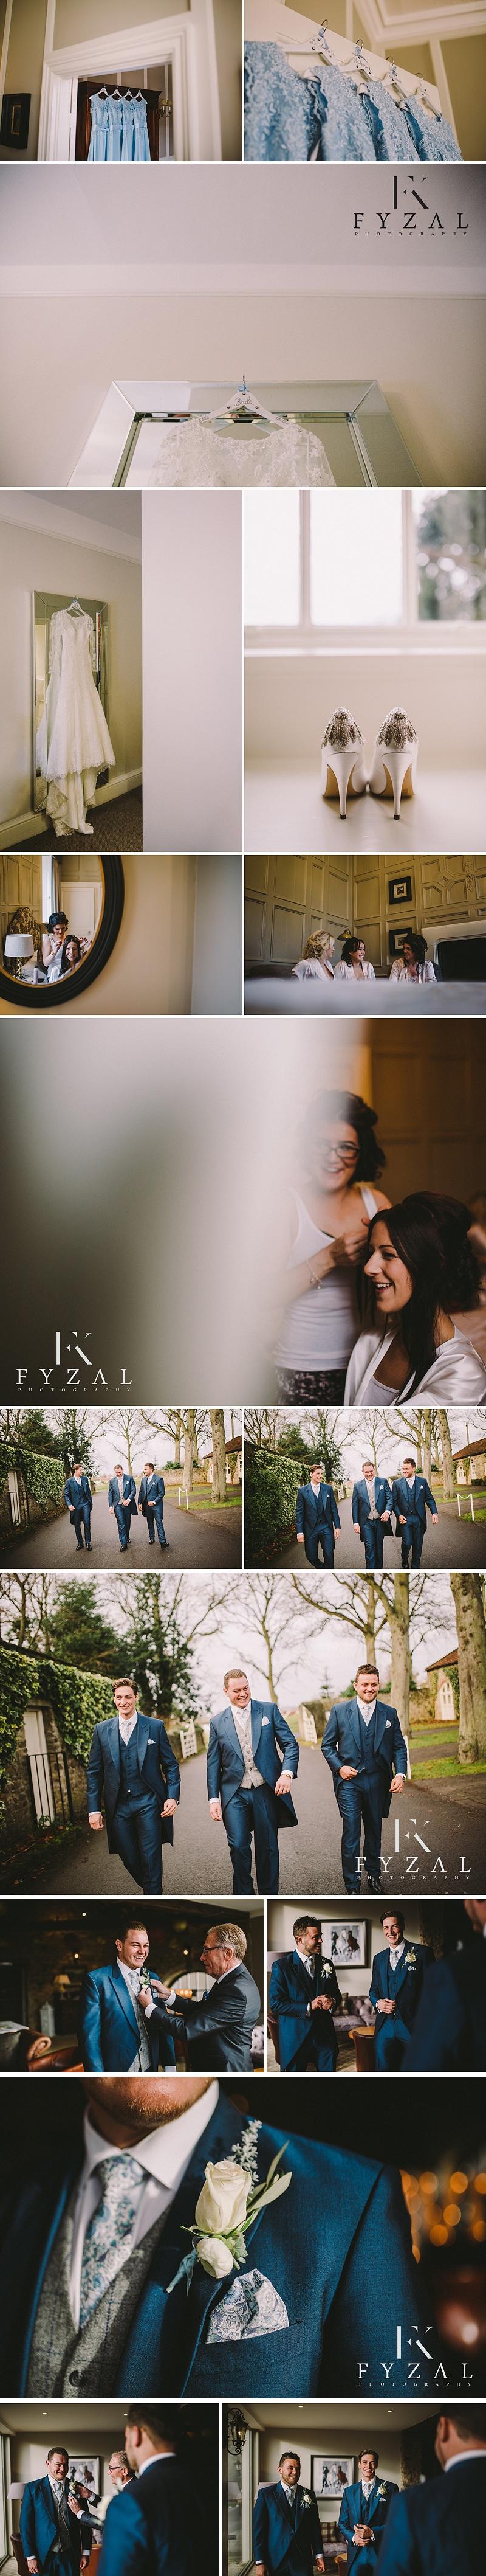 161203-Ellie-Simon-Wedding-02.jpg